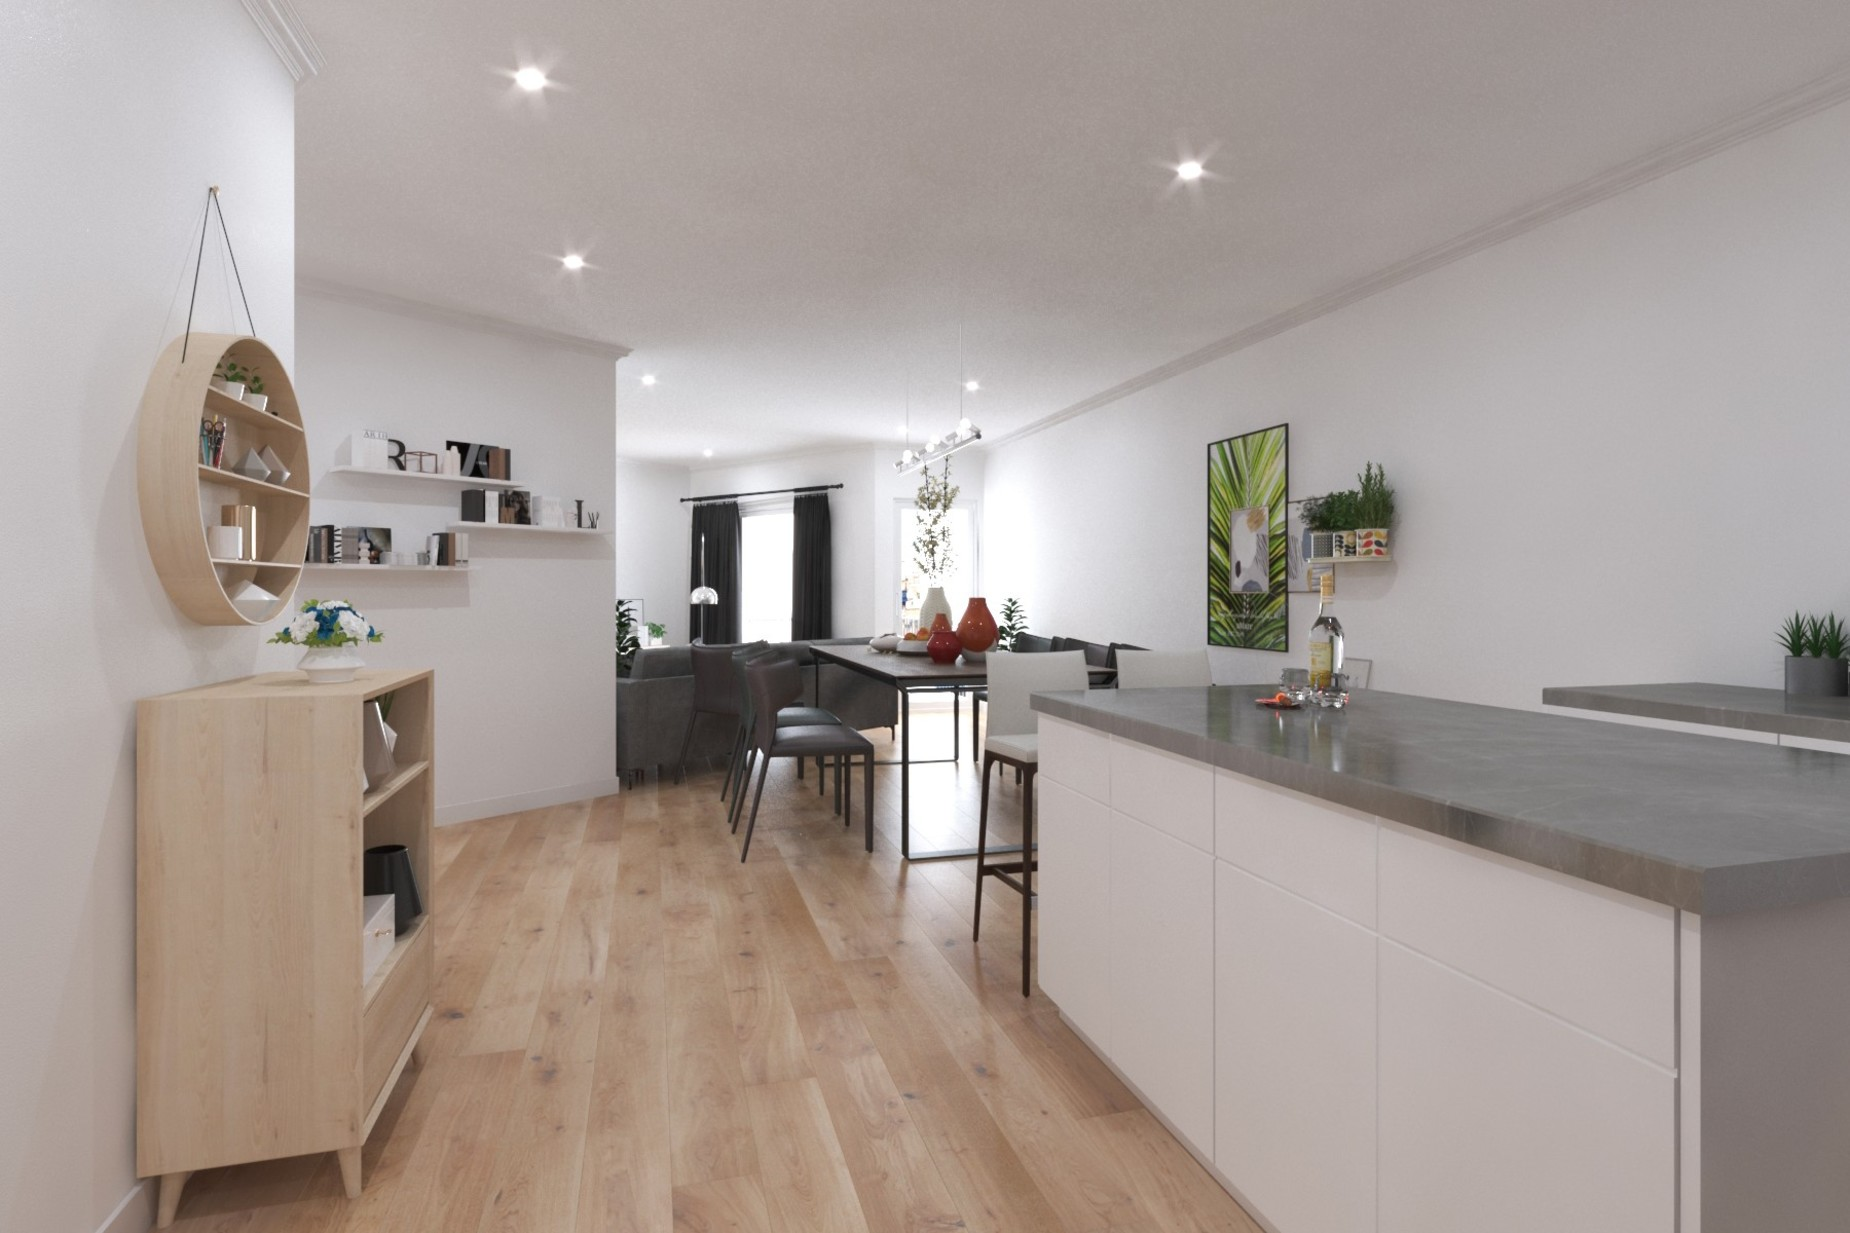 2 bed Apartment For Sale in Birkirkara, Birkirkara - thumb 2